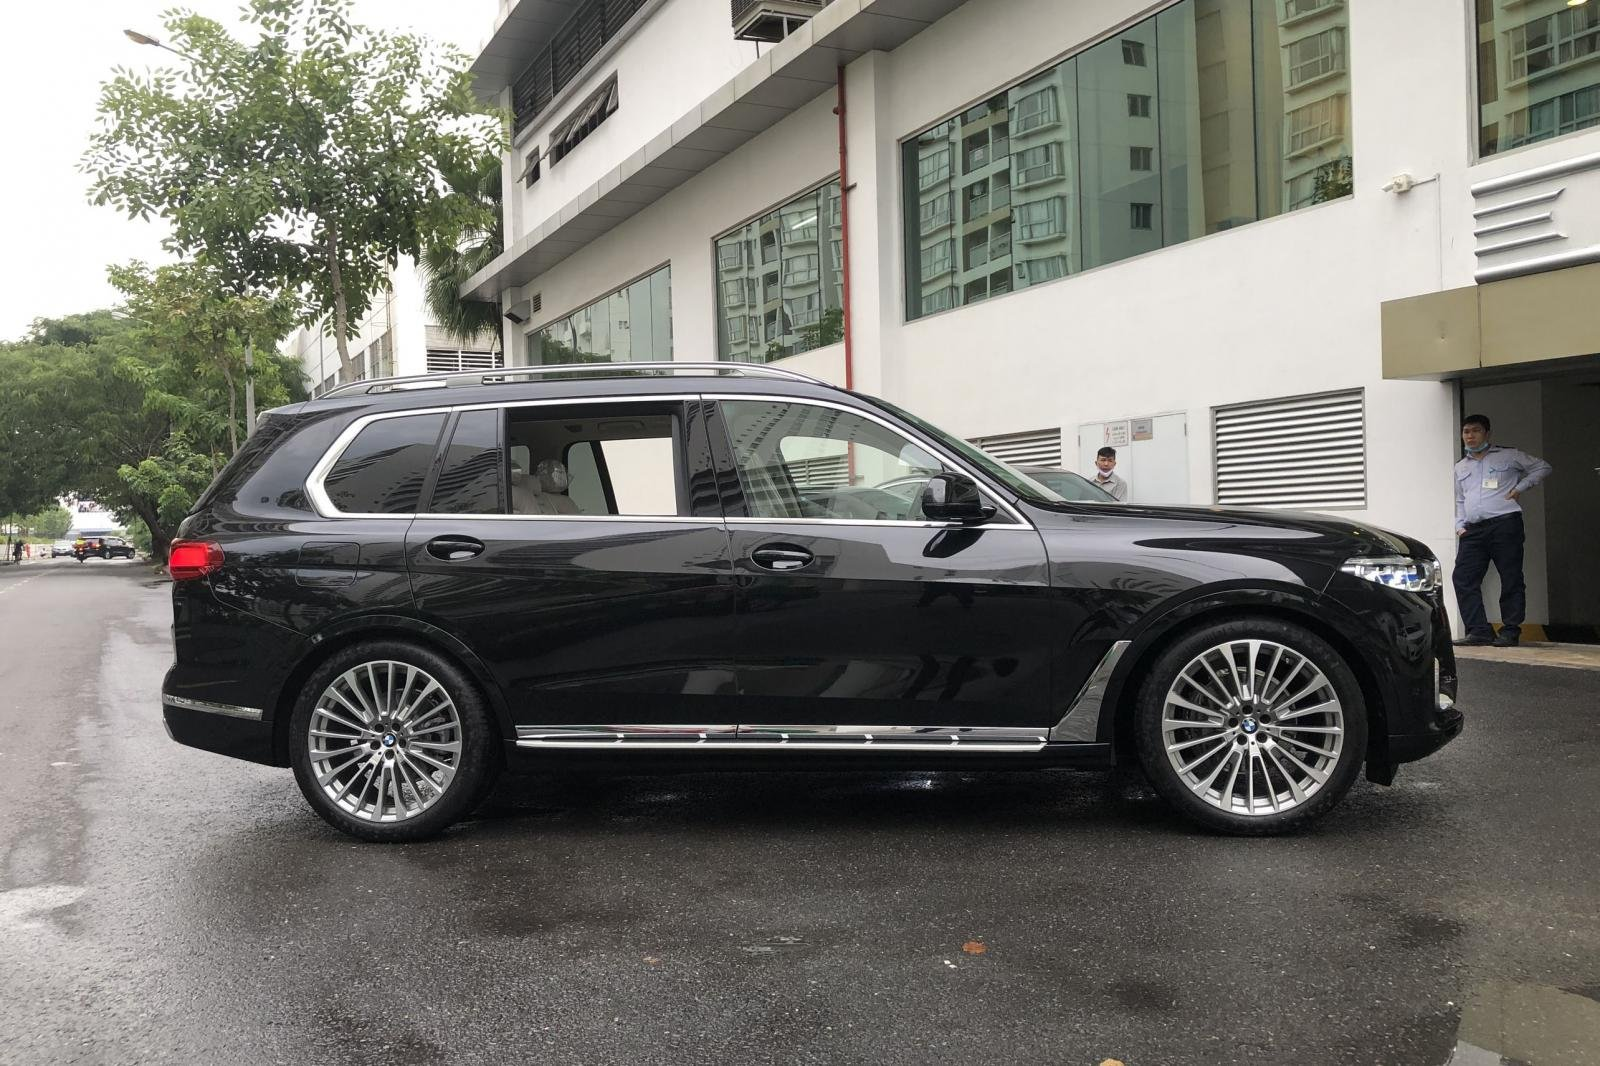 ngoại thất BMW X7 2021.